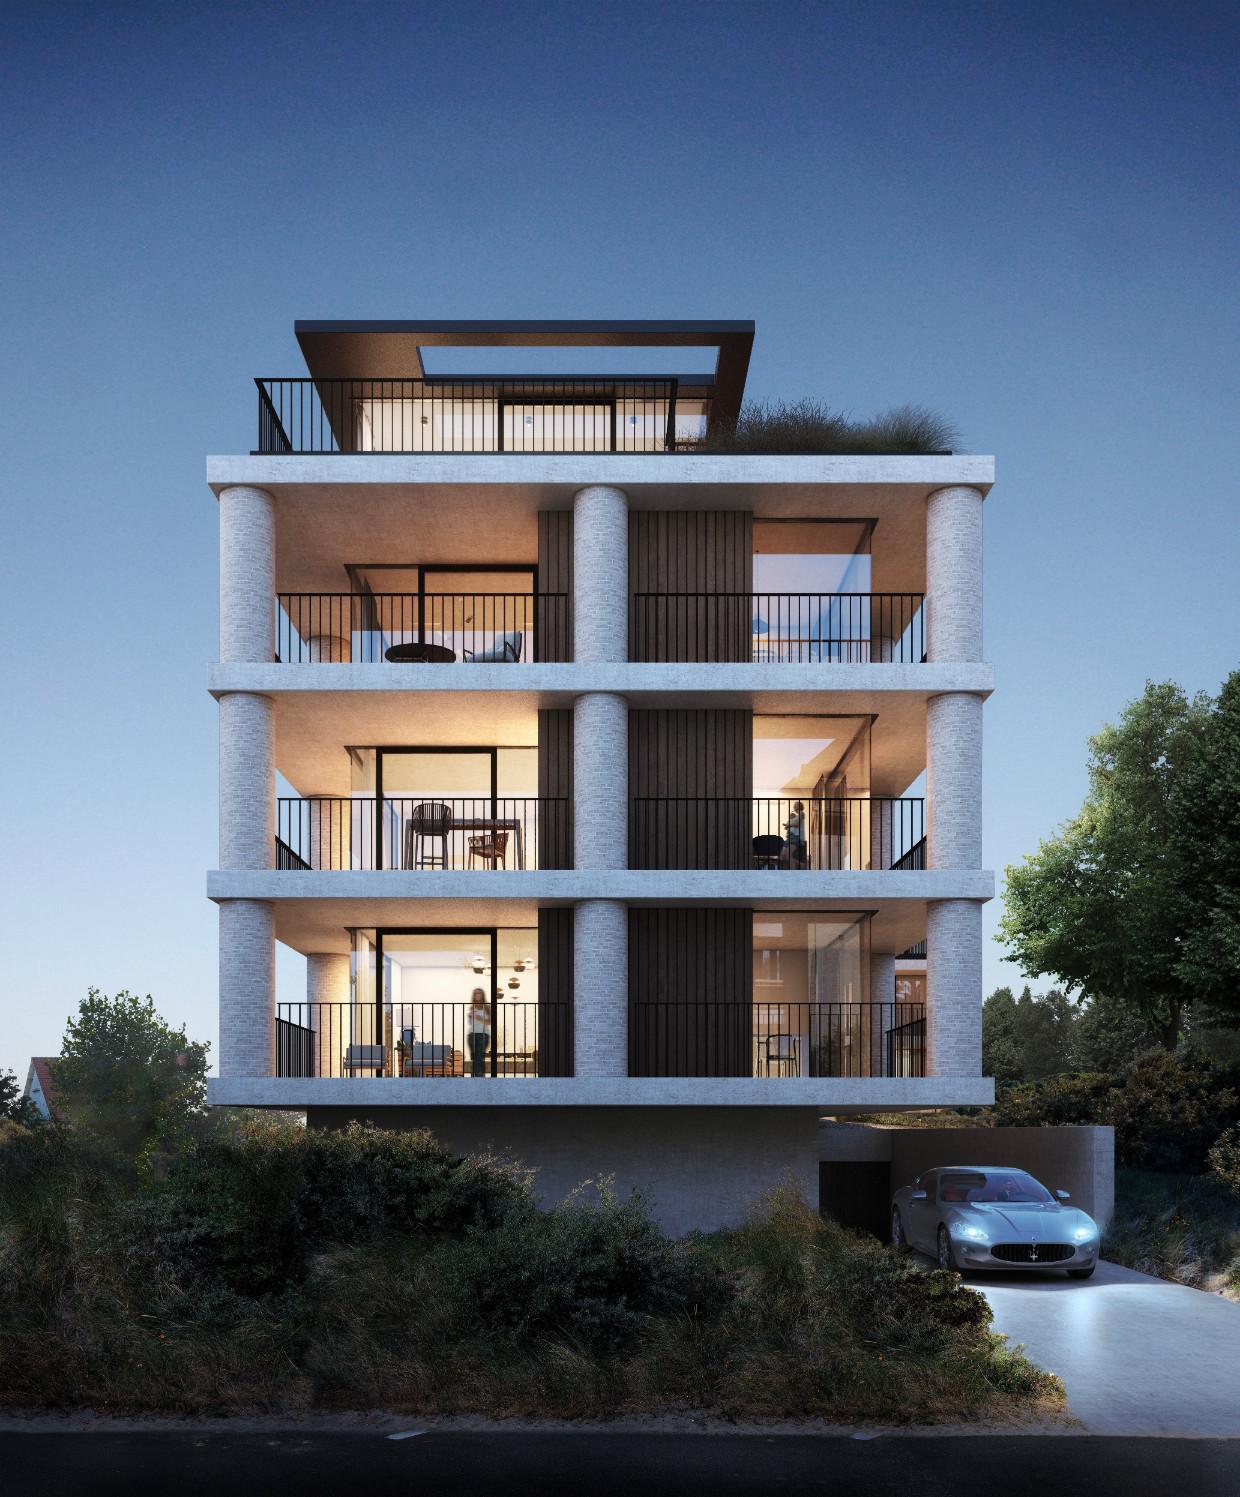 Theo van Doesburg - Oostduinkerke - Te koop - Rietveldprojects - Caan Architecten3 2_1240x0.jpg